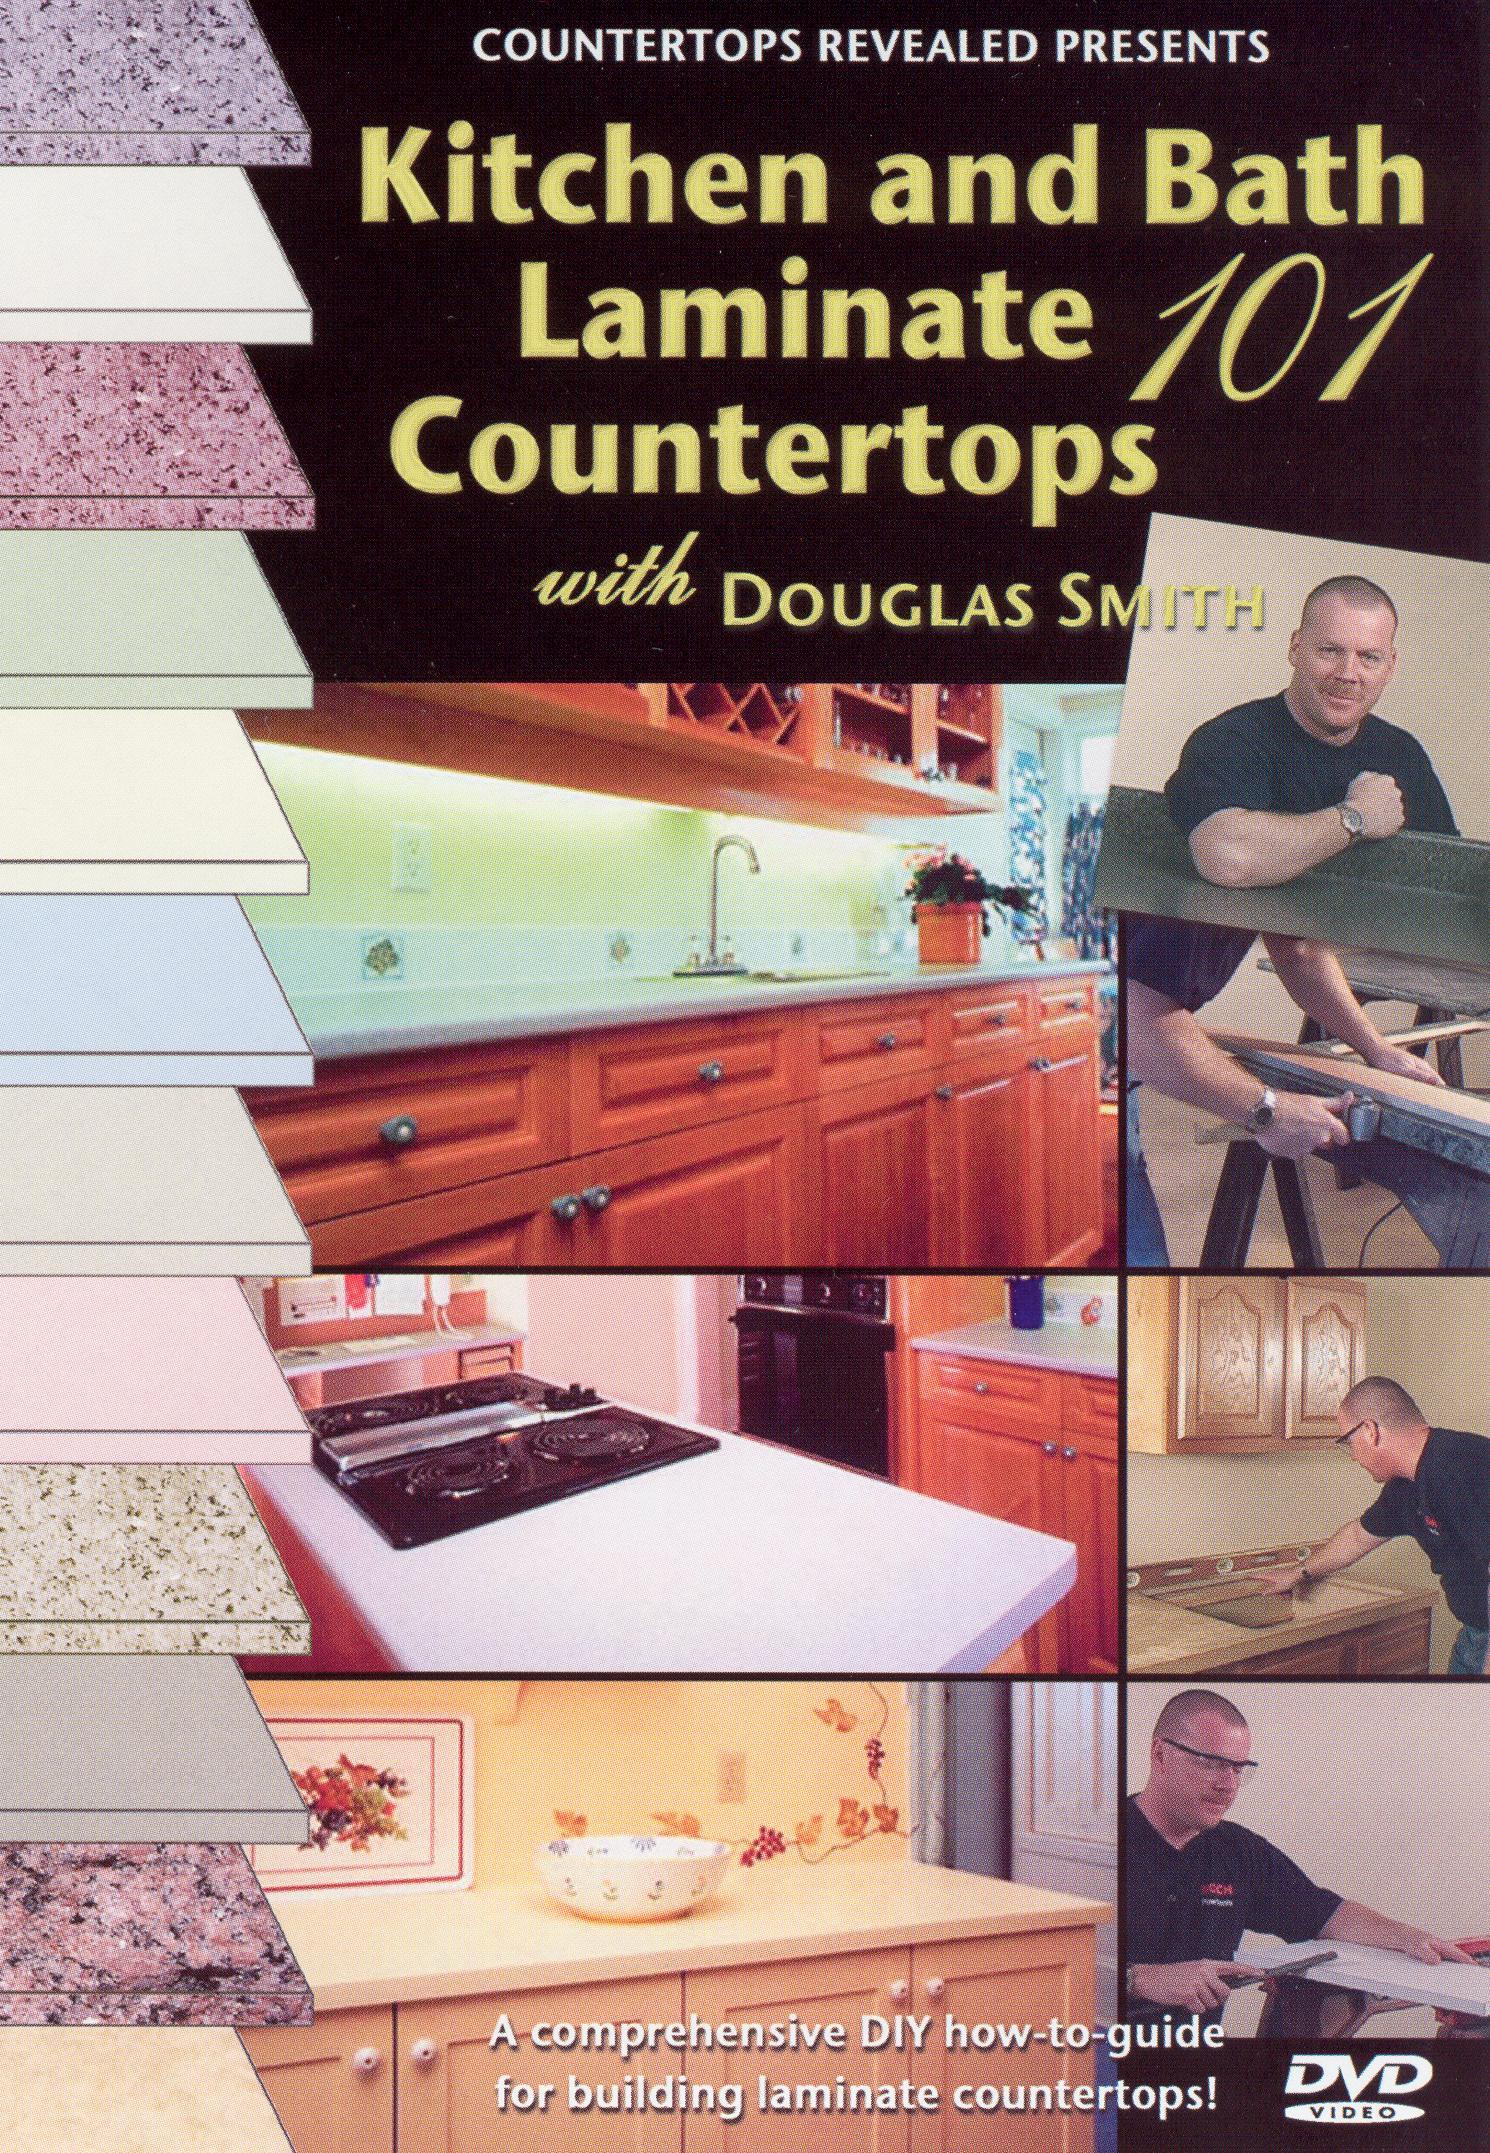 Countertops 101: Kitchen and Bath Laminate Countertops